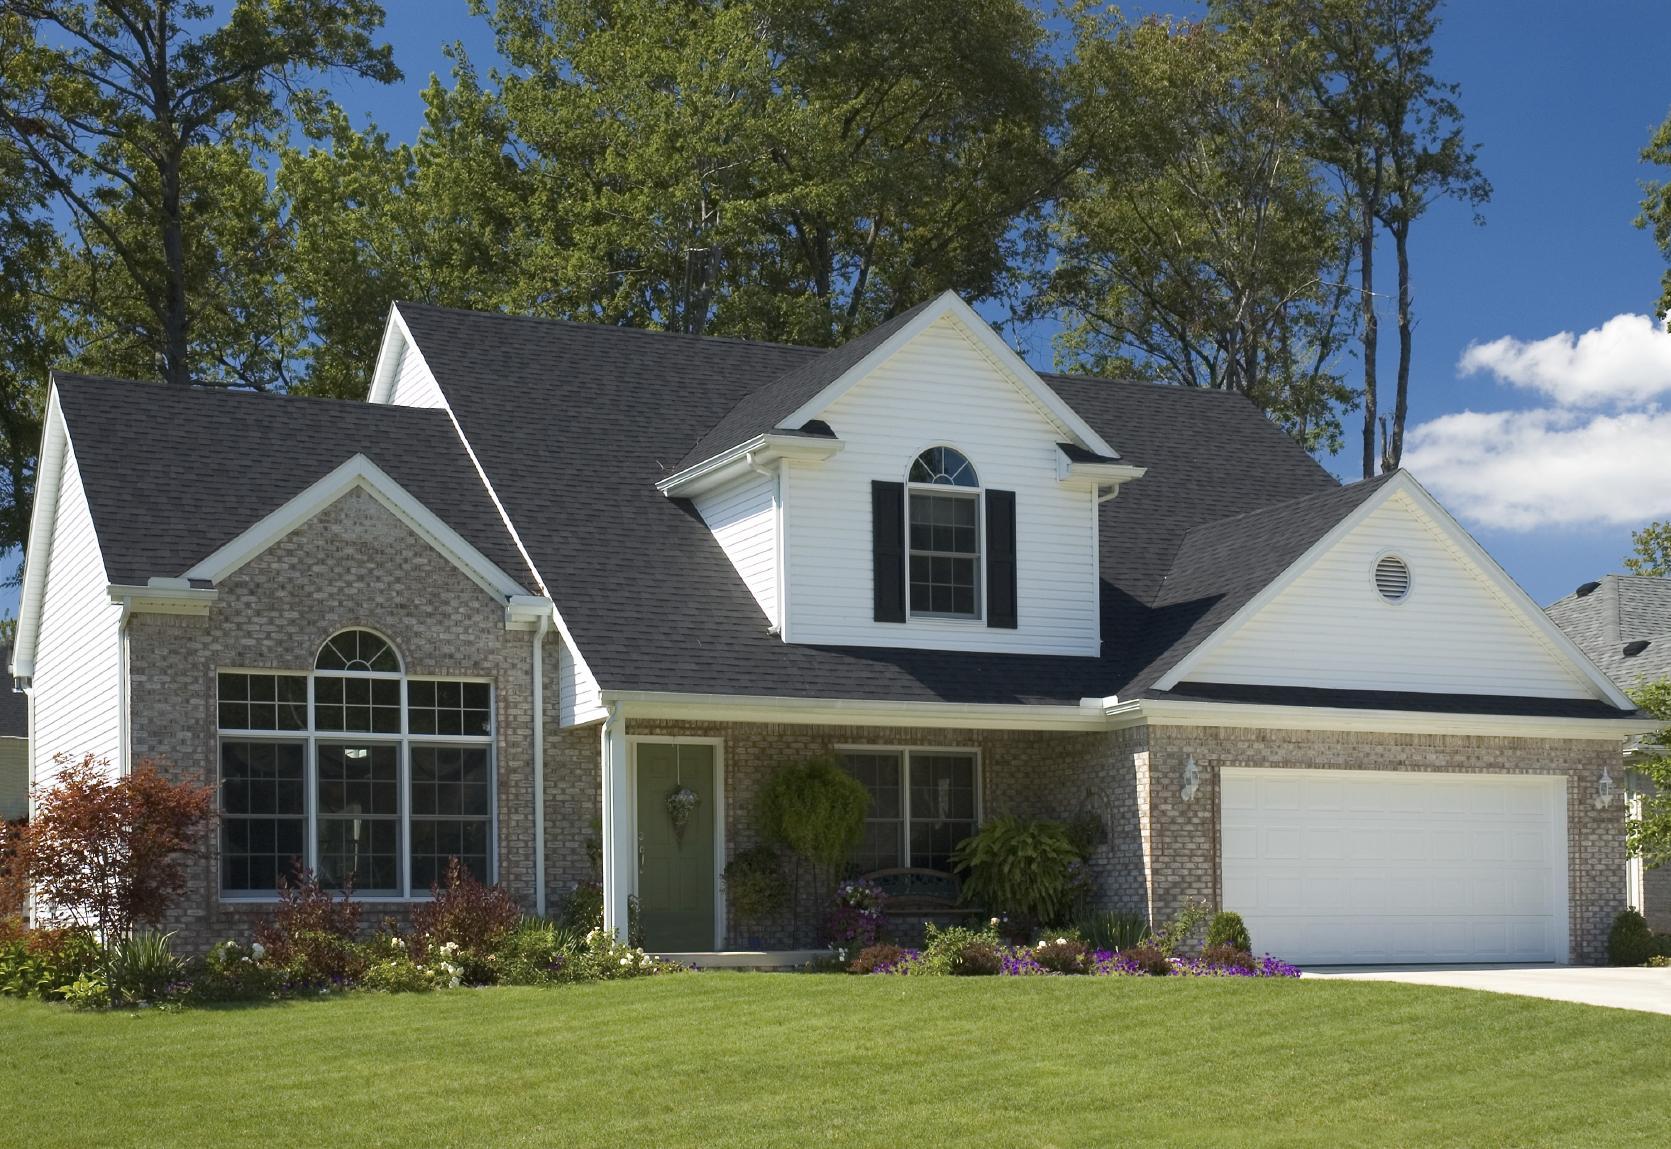 lawn care services csi of virginia pest control fredericksburg va fairfax and manassas. Black Bedroom Furniture Sets. Home Design Ideas